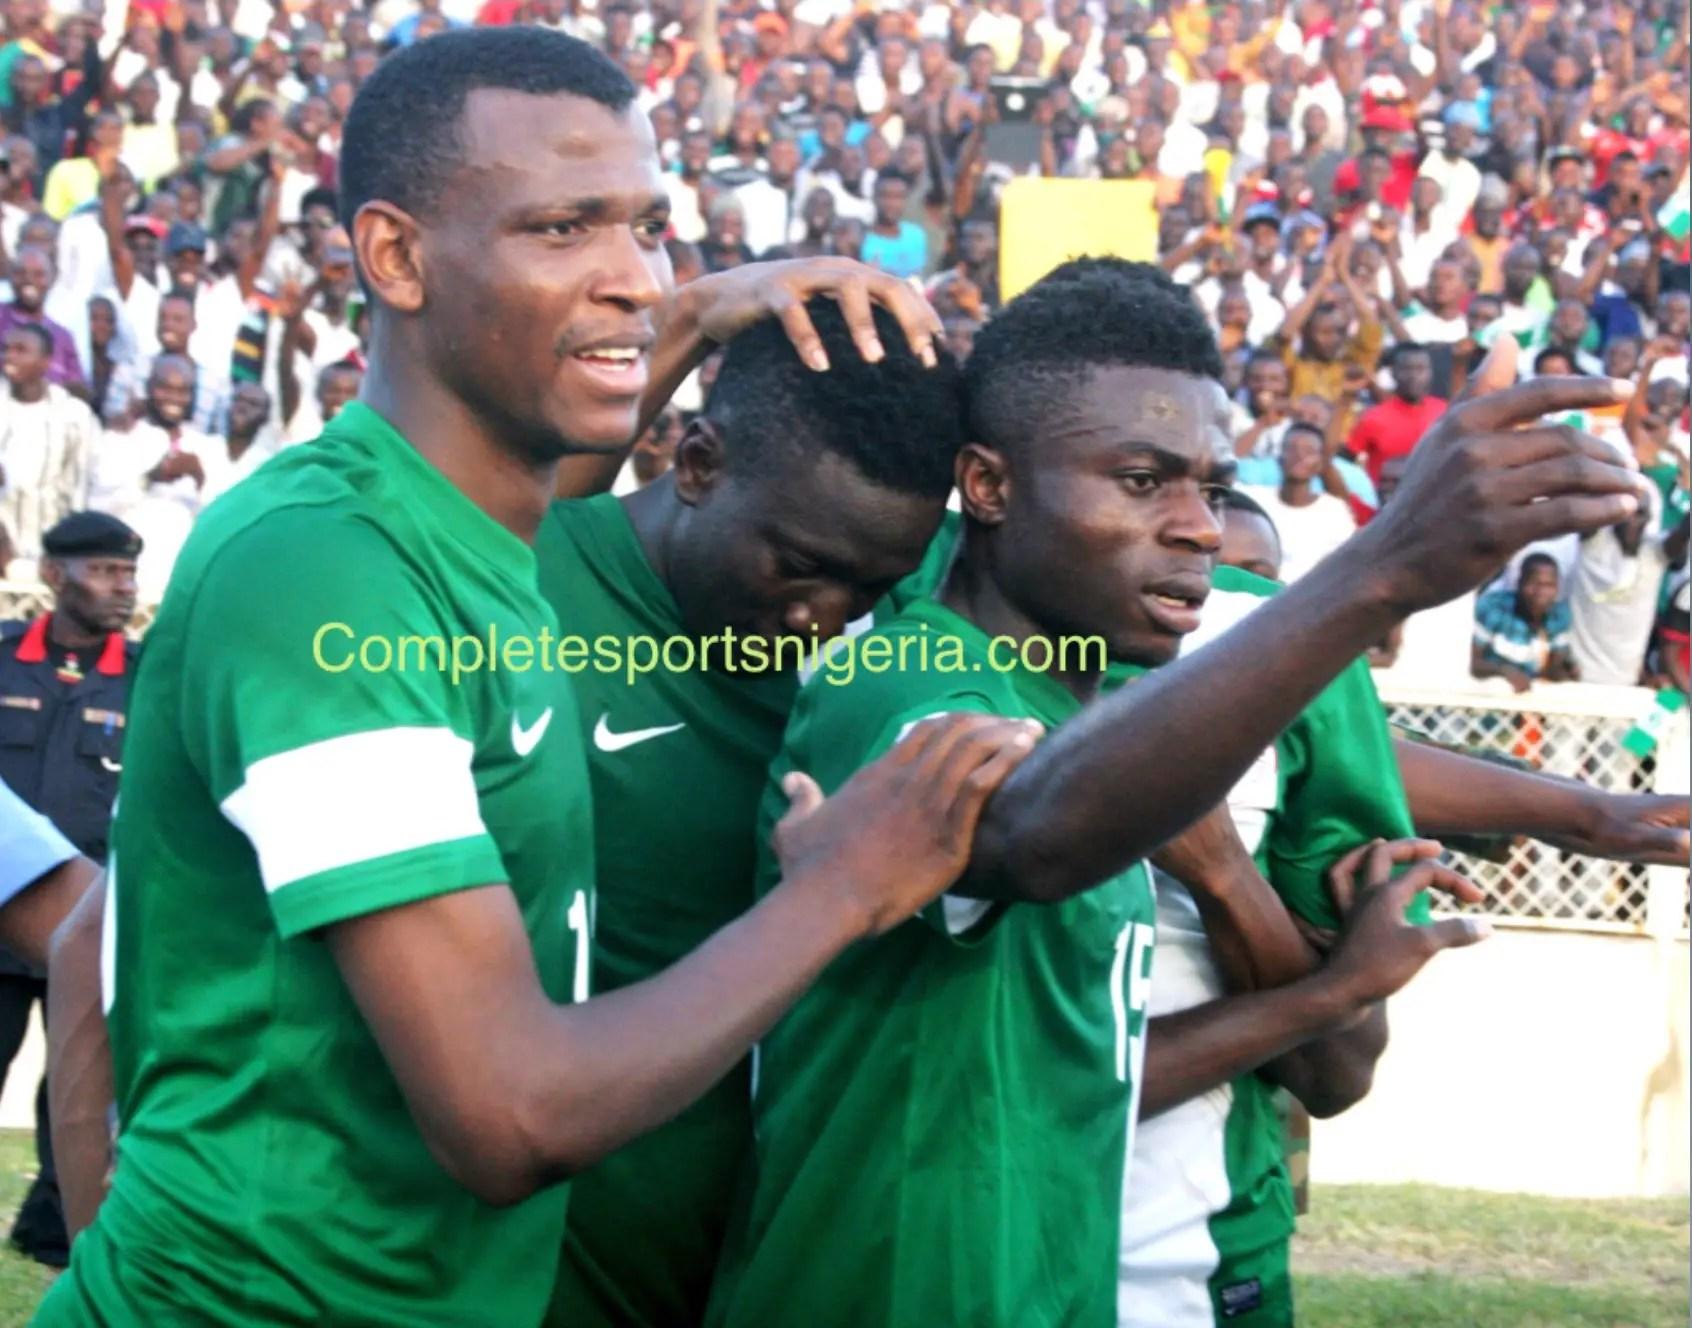 Yusuf Invites Mikel, Ideye, Iwobi, 23 Others For Mali, Luxembourg Friendlies